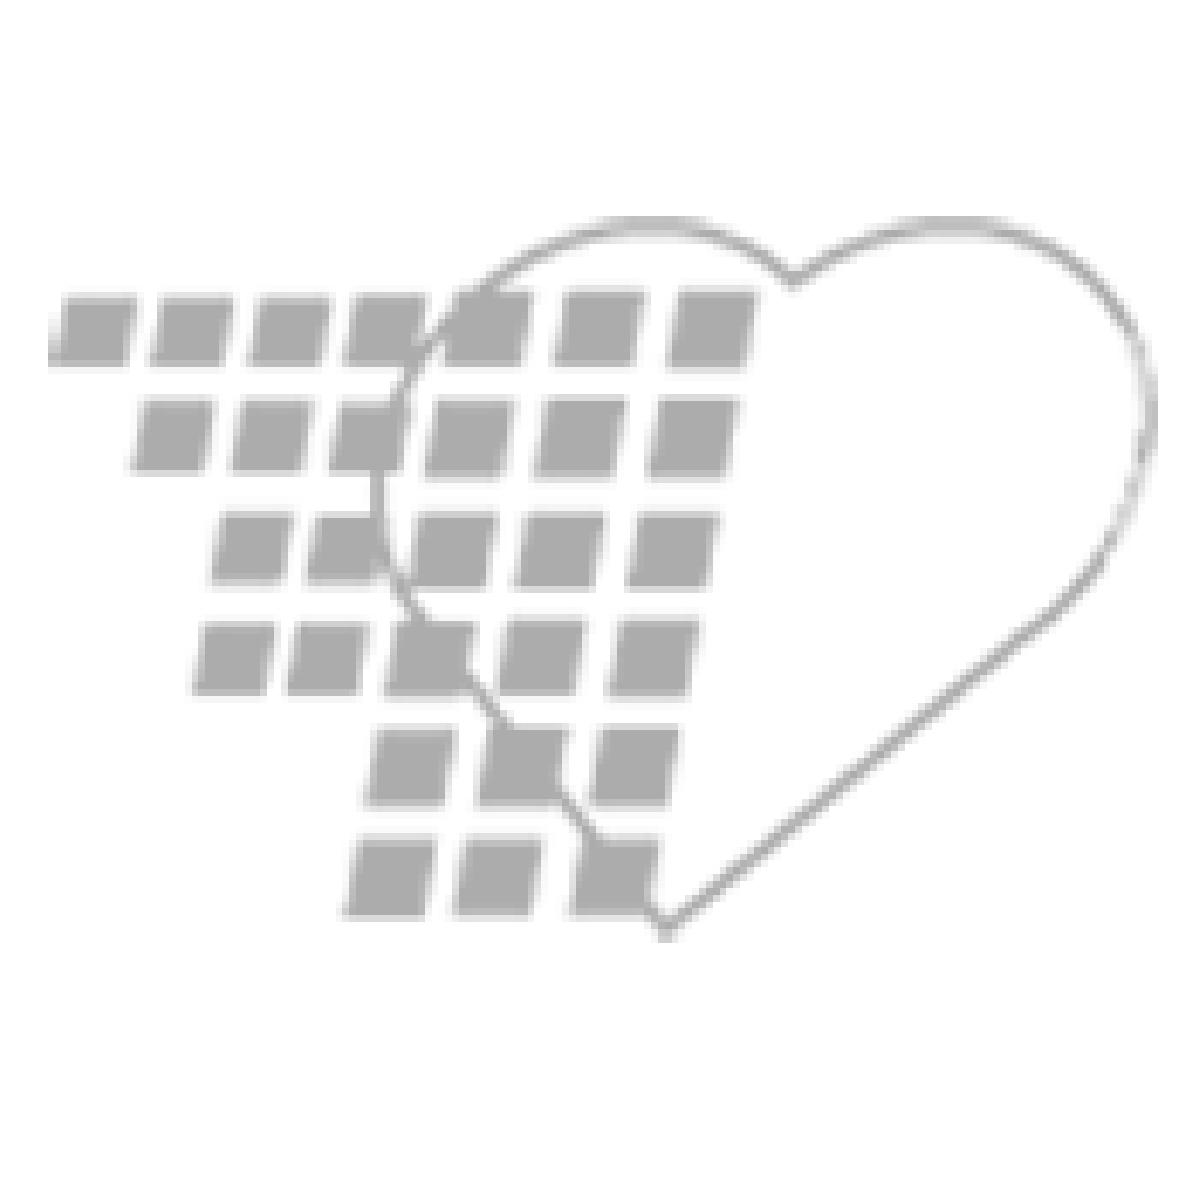 07-71-7815 Argyle™ Tracheostomy Care Tray